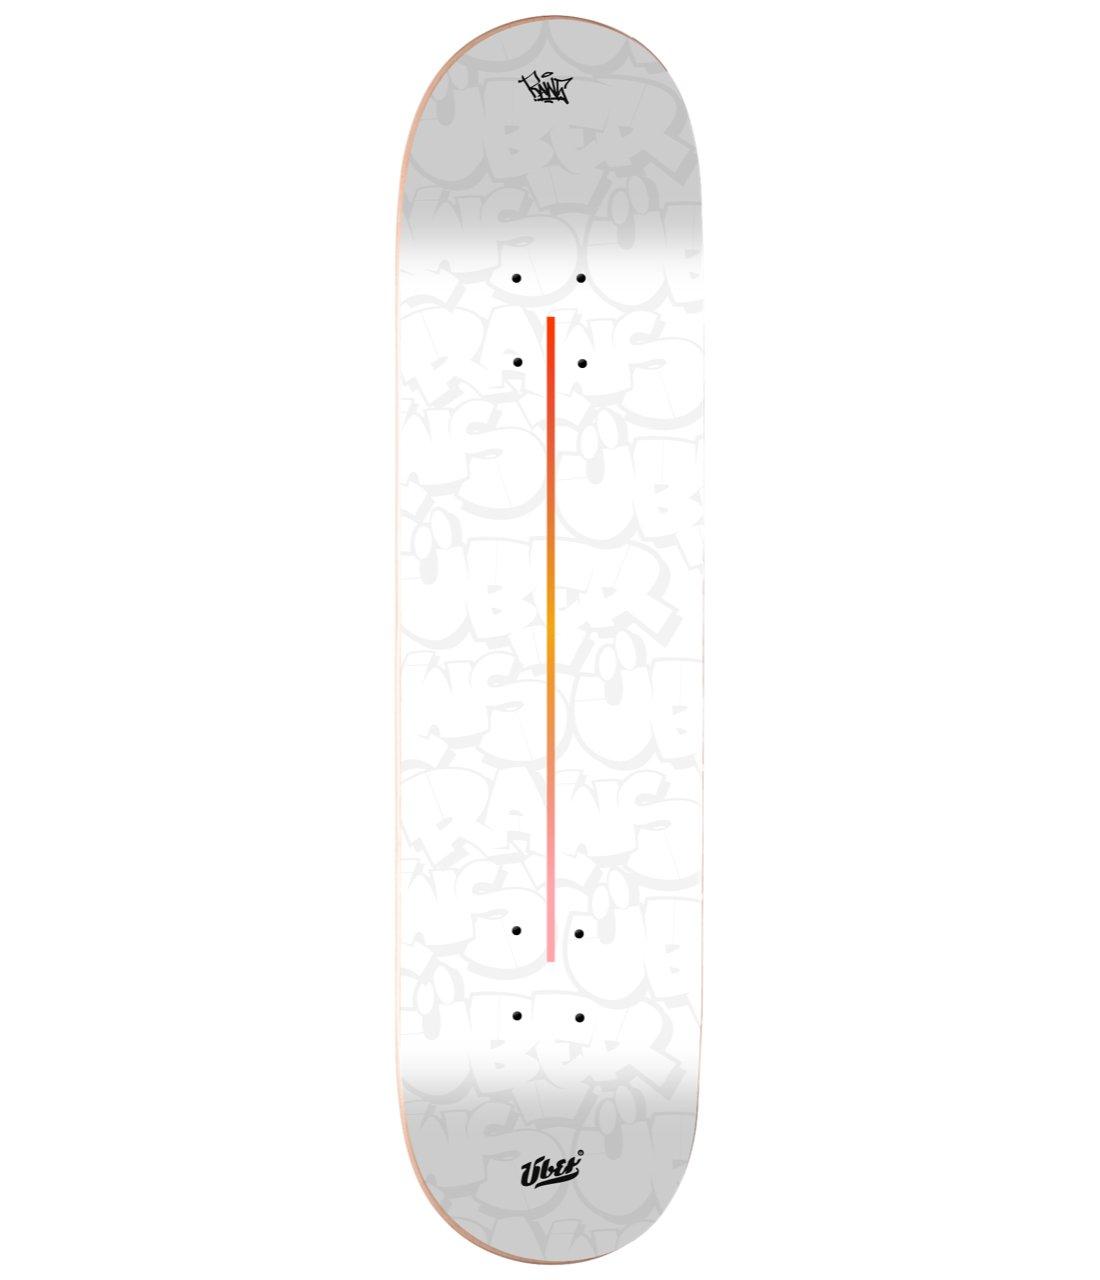 Image of RAWS X ÜBER | Skatedeck (White) SIGNED BY RAWS